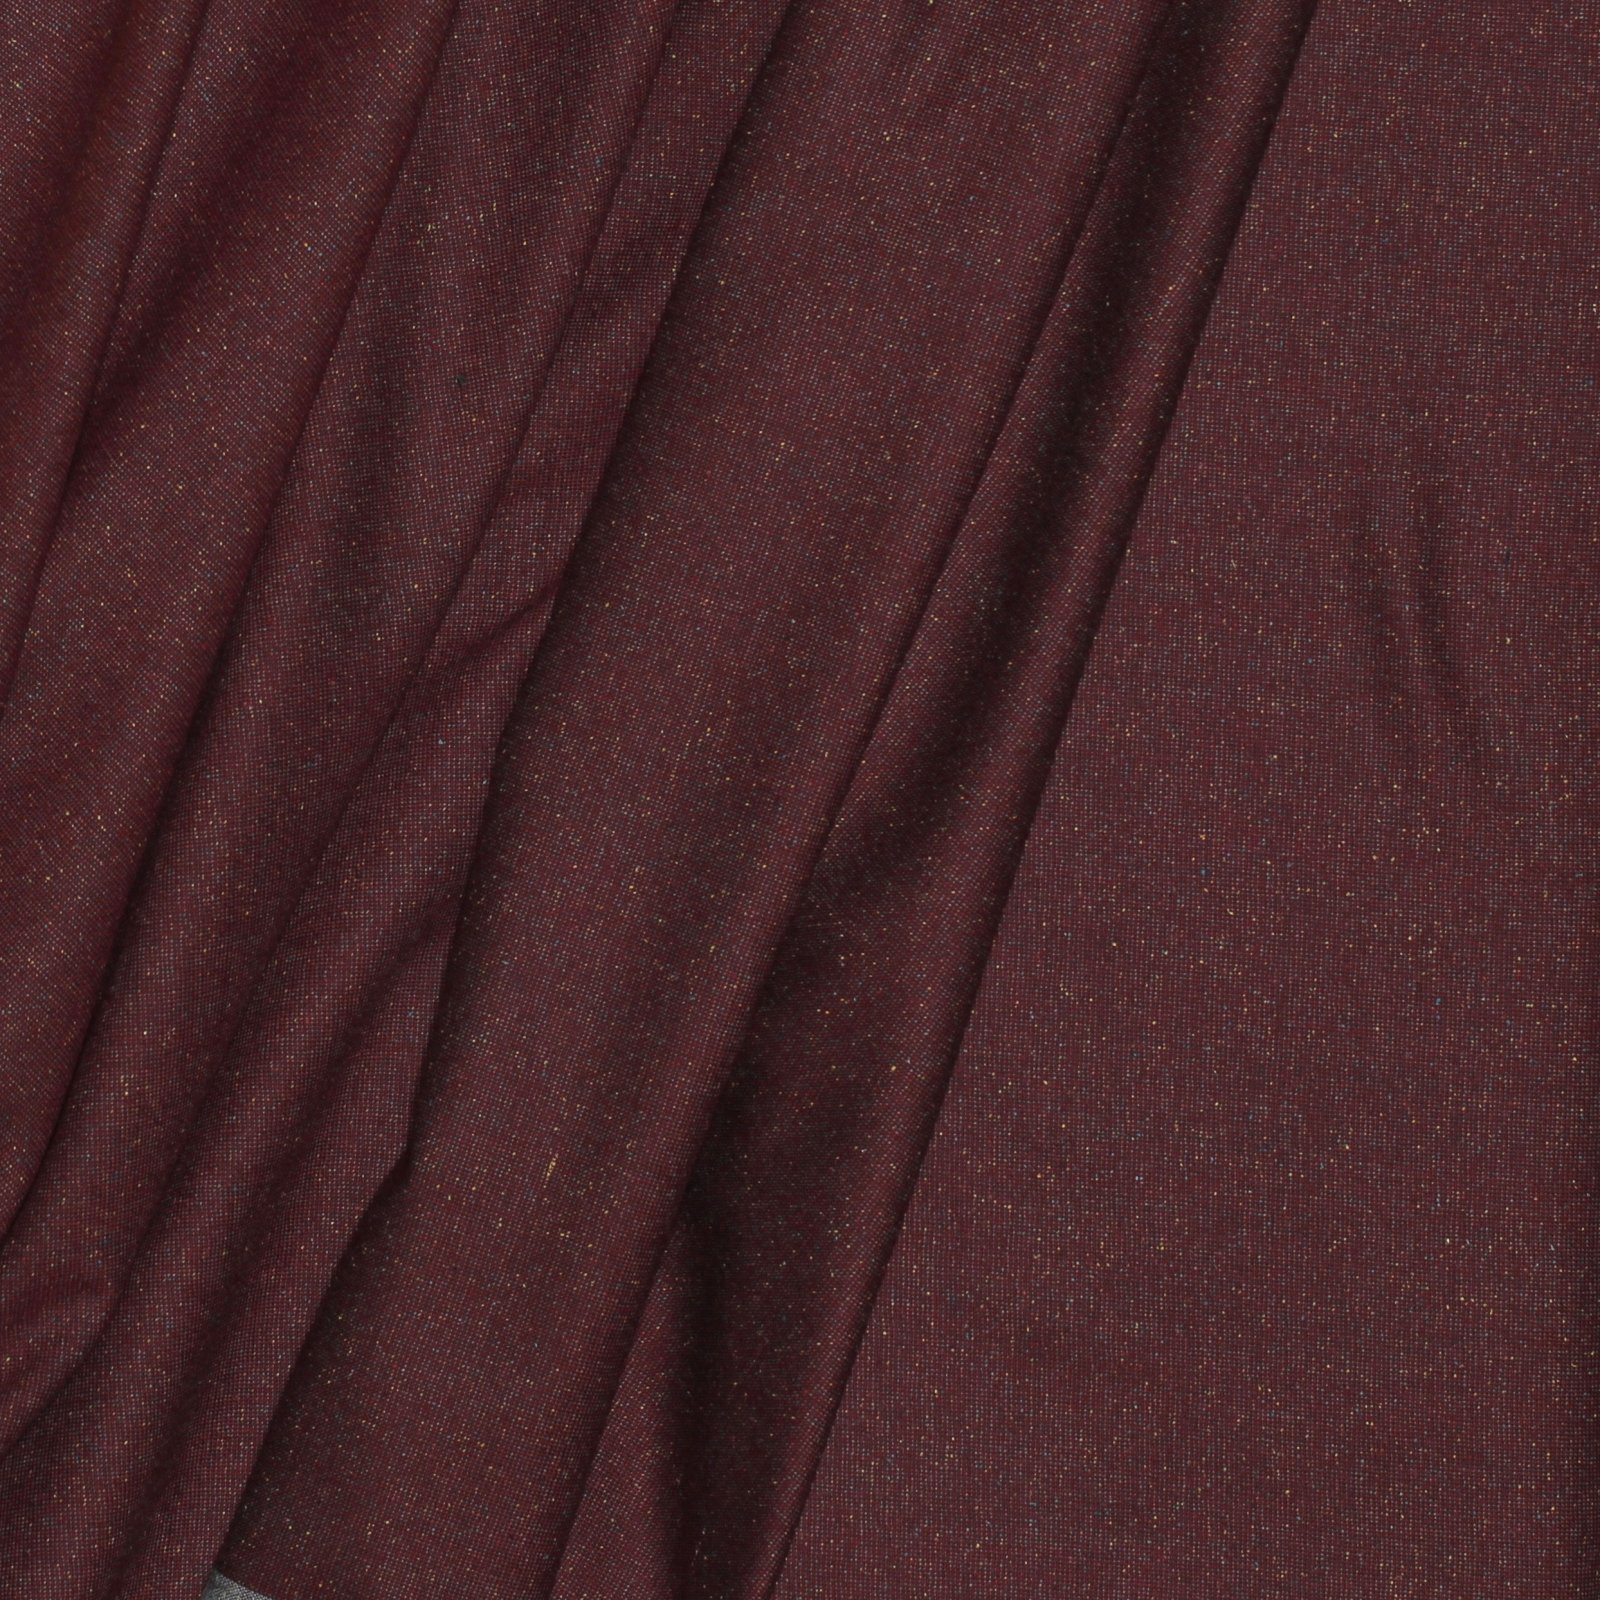 Burgundy w/Fleck Italian Linen/Silk/Wool Blend